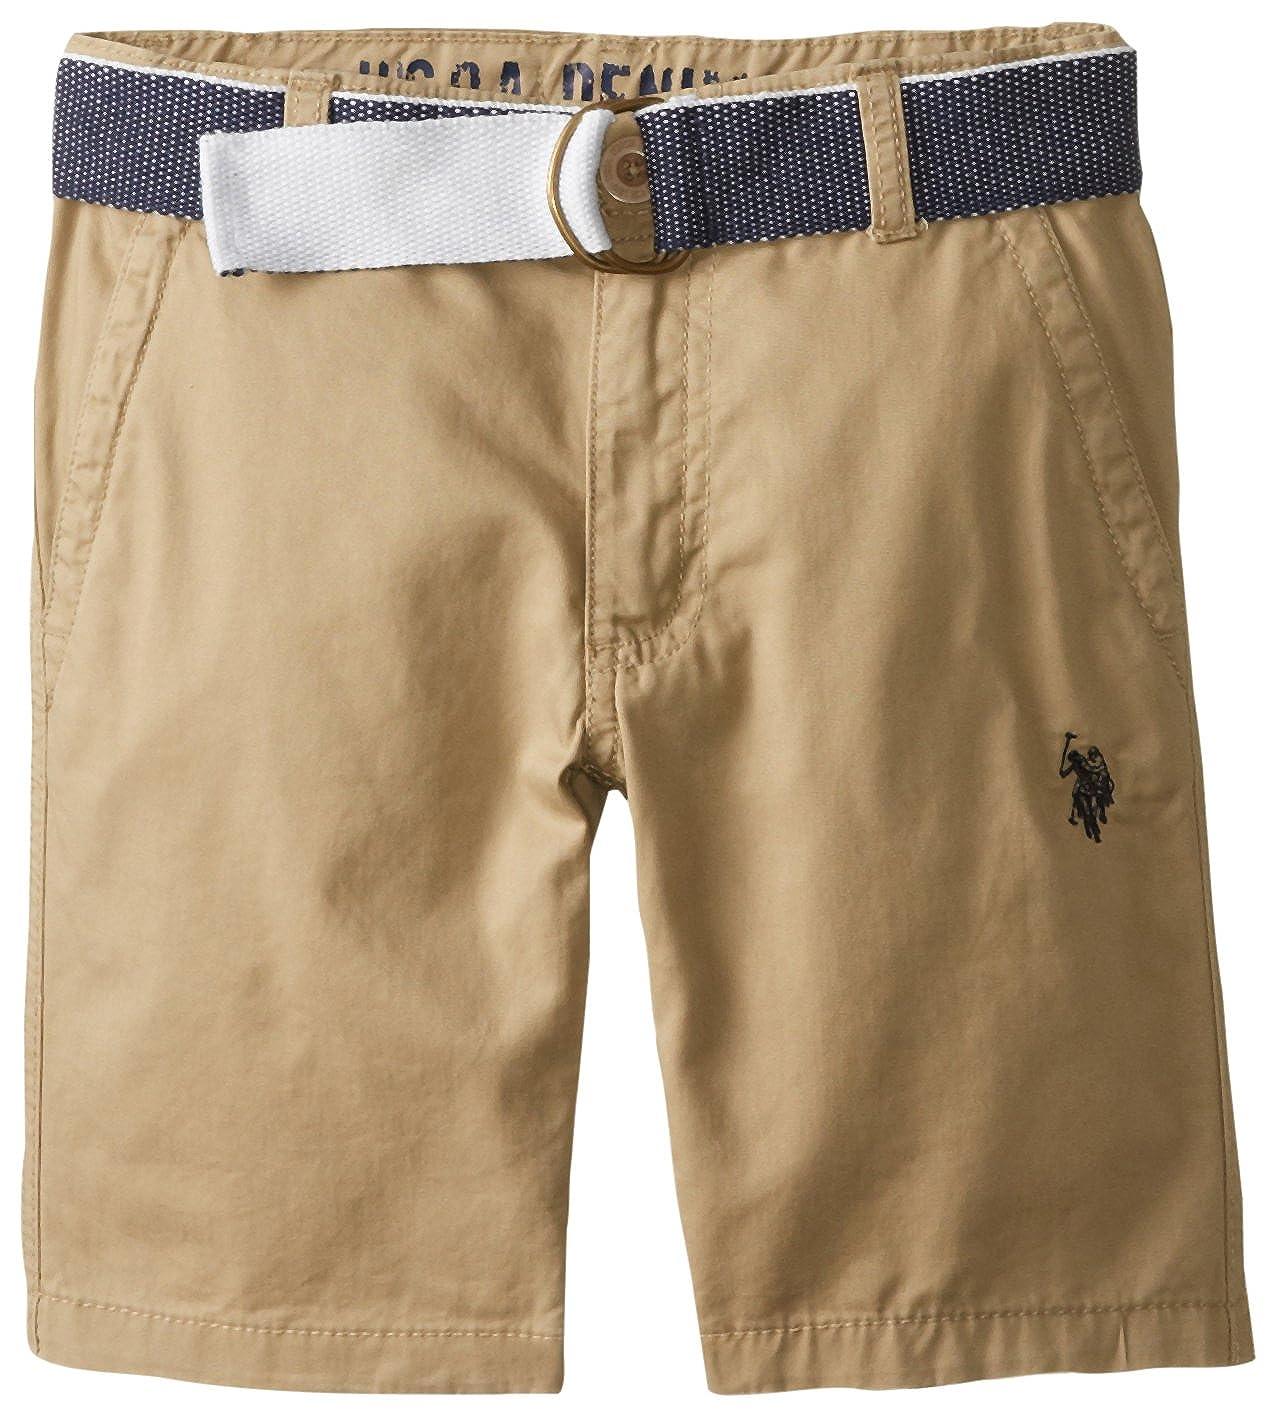 U.S. Polo Assn. Boys' Twill Short with Belt